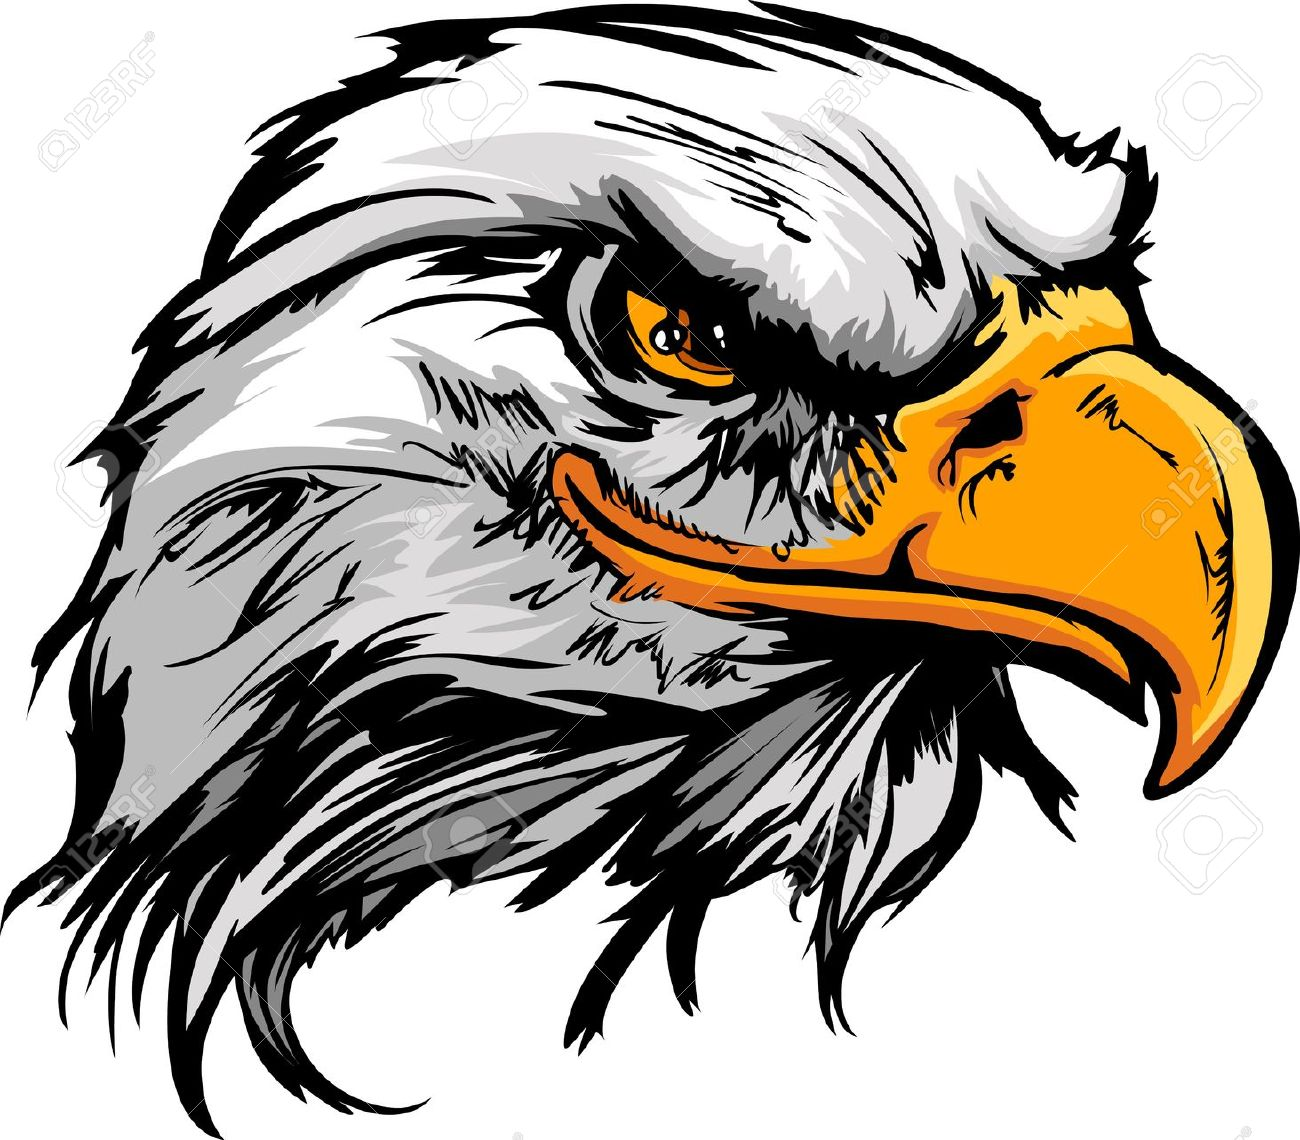 Hawk clipart #15, Download drawings